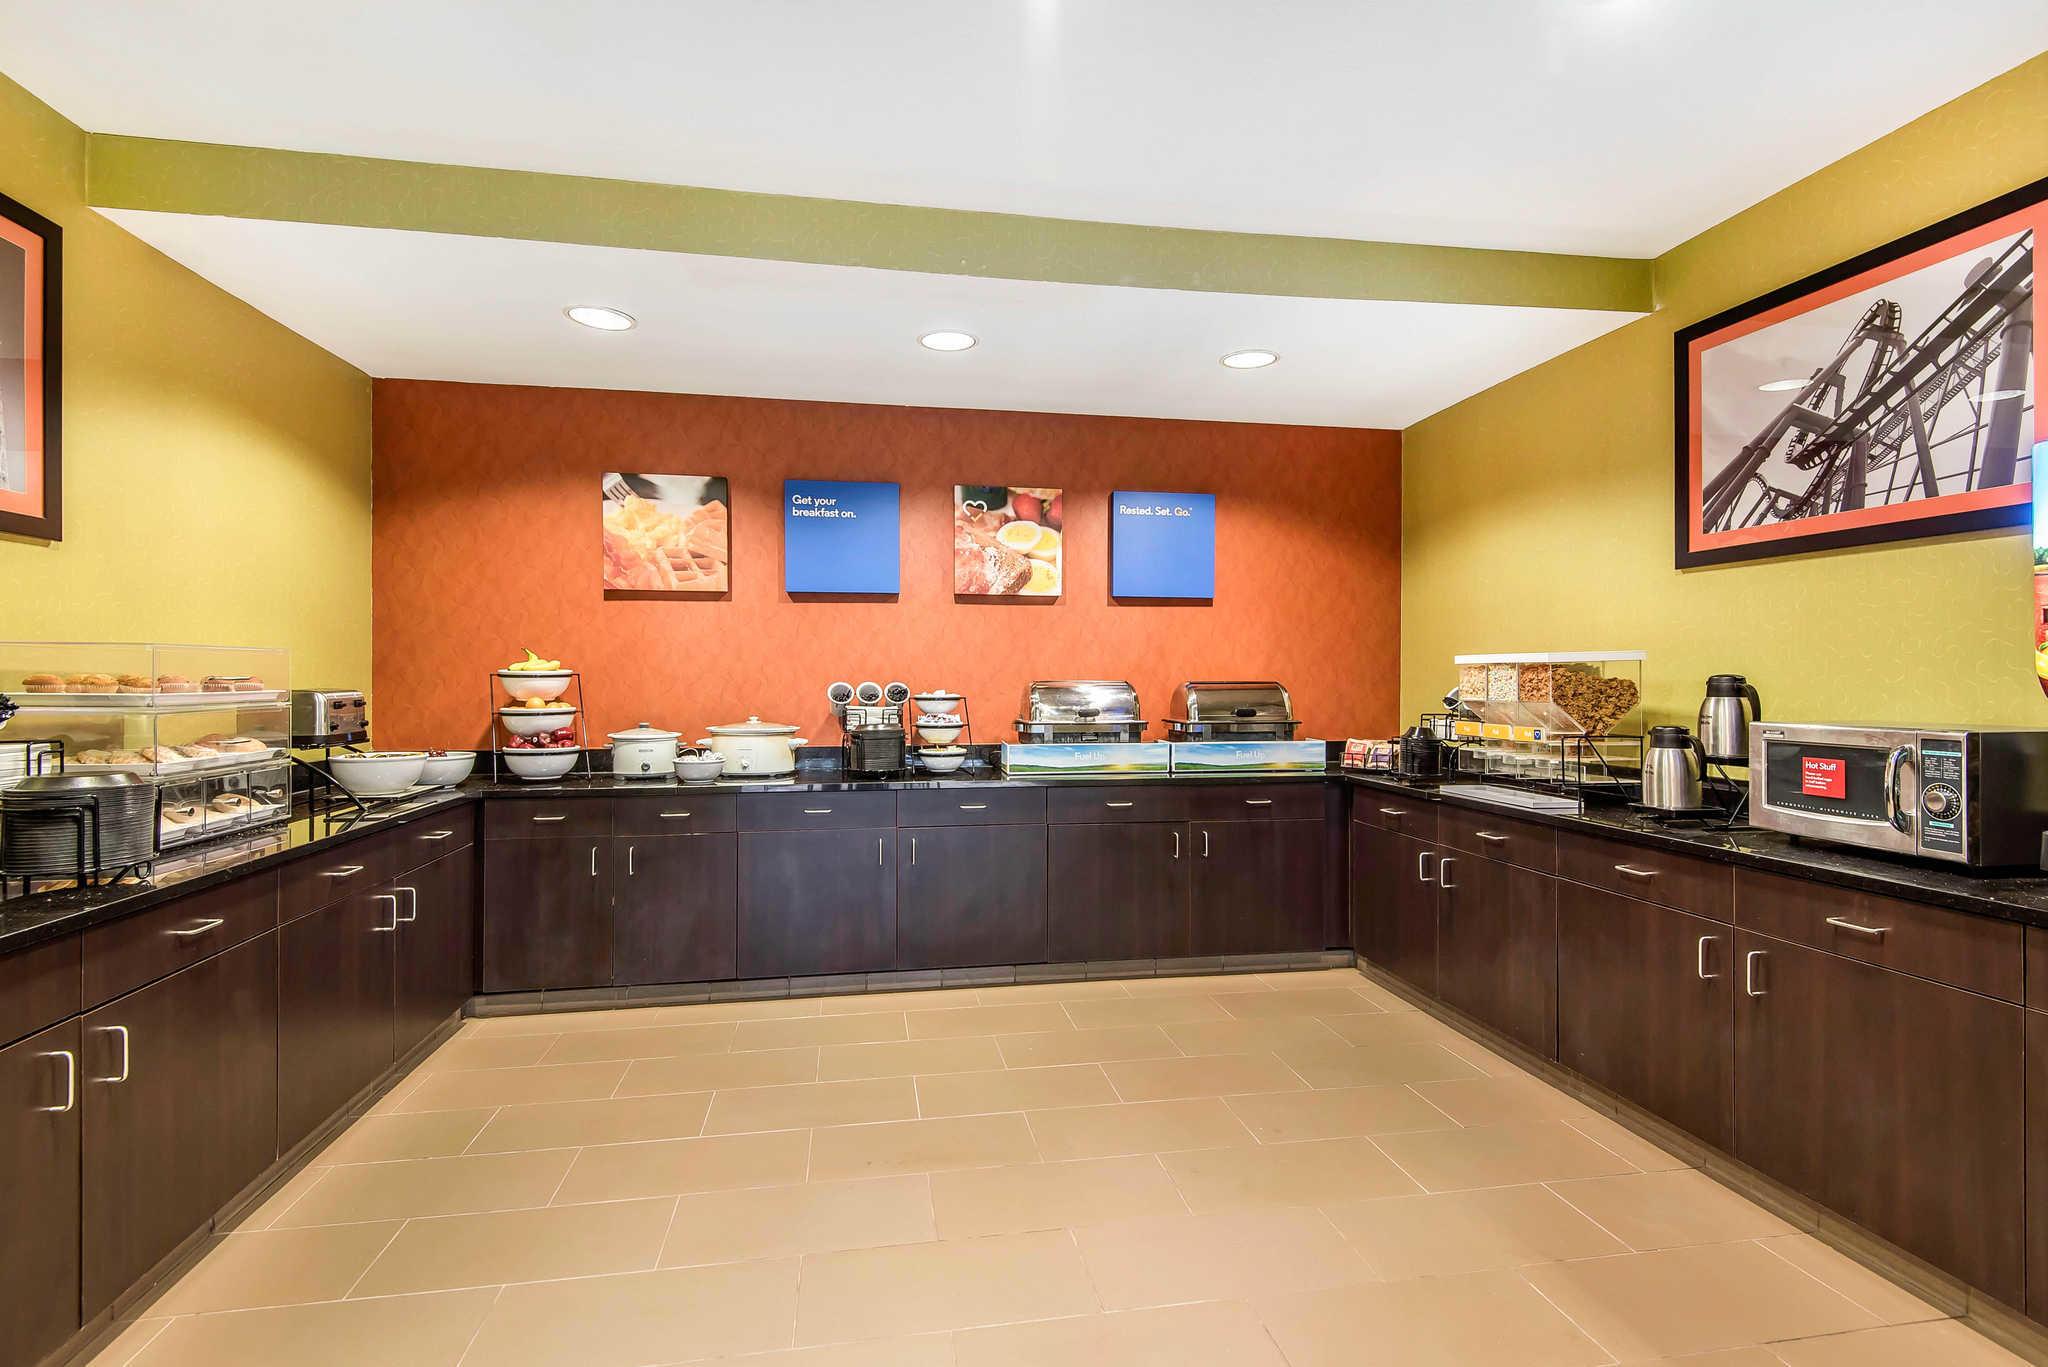 Comfort Inn & Suites Kansas City - Northeast image 24